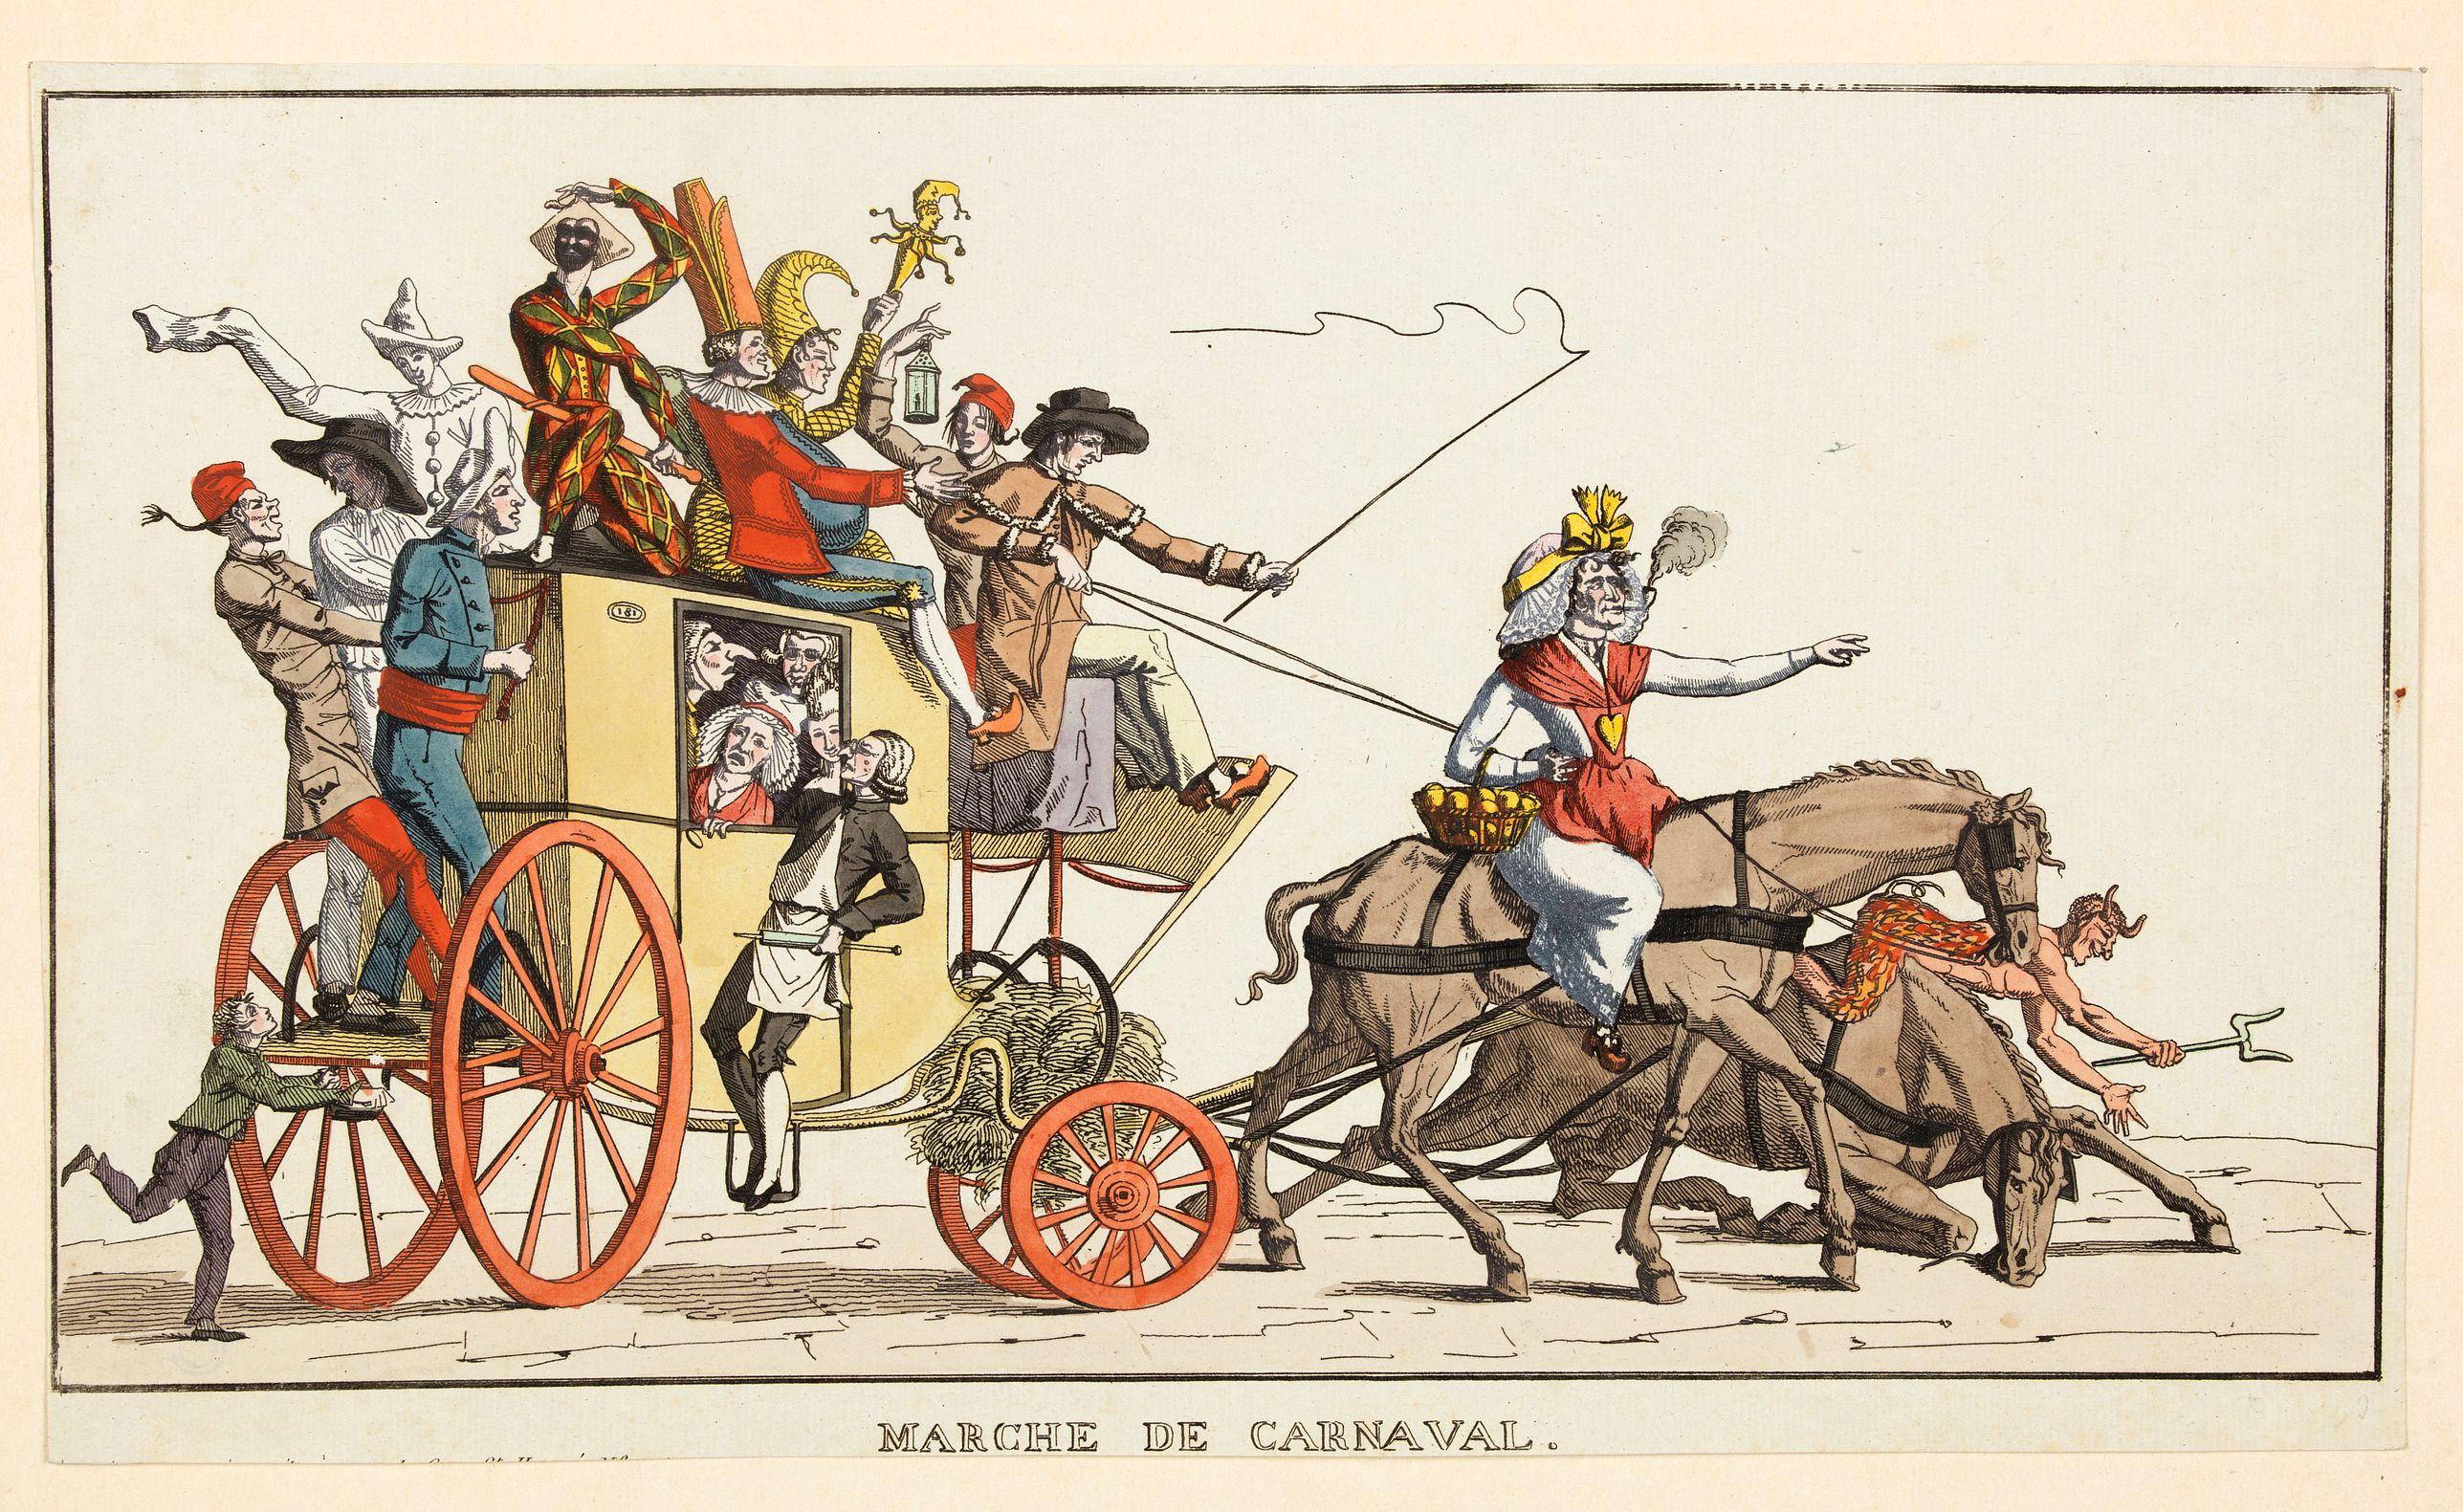 CHARON. -  Marche de Carnaval. [Canival Walk]